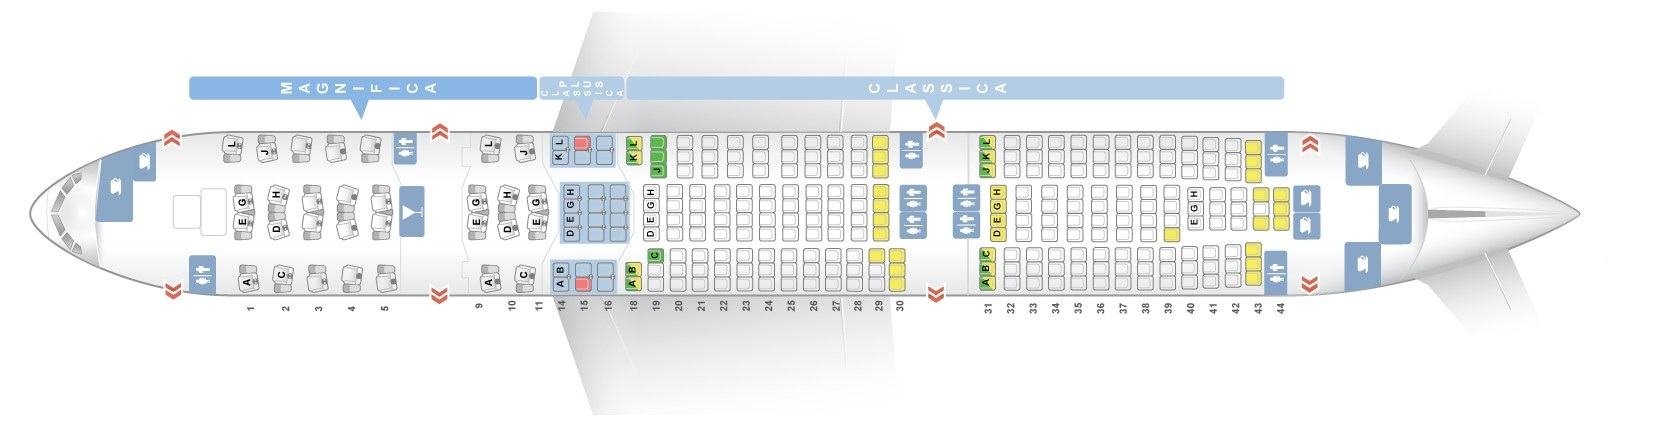 Alitalia Seating Charts Brokeasshome Com